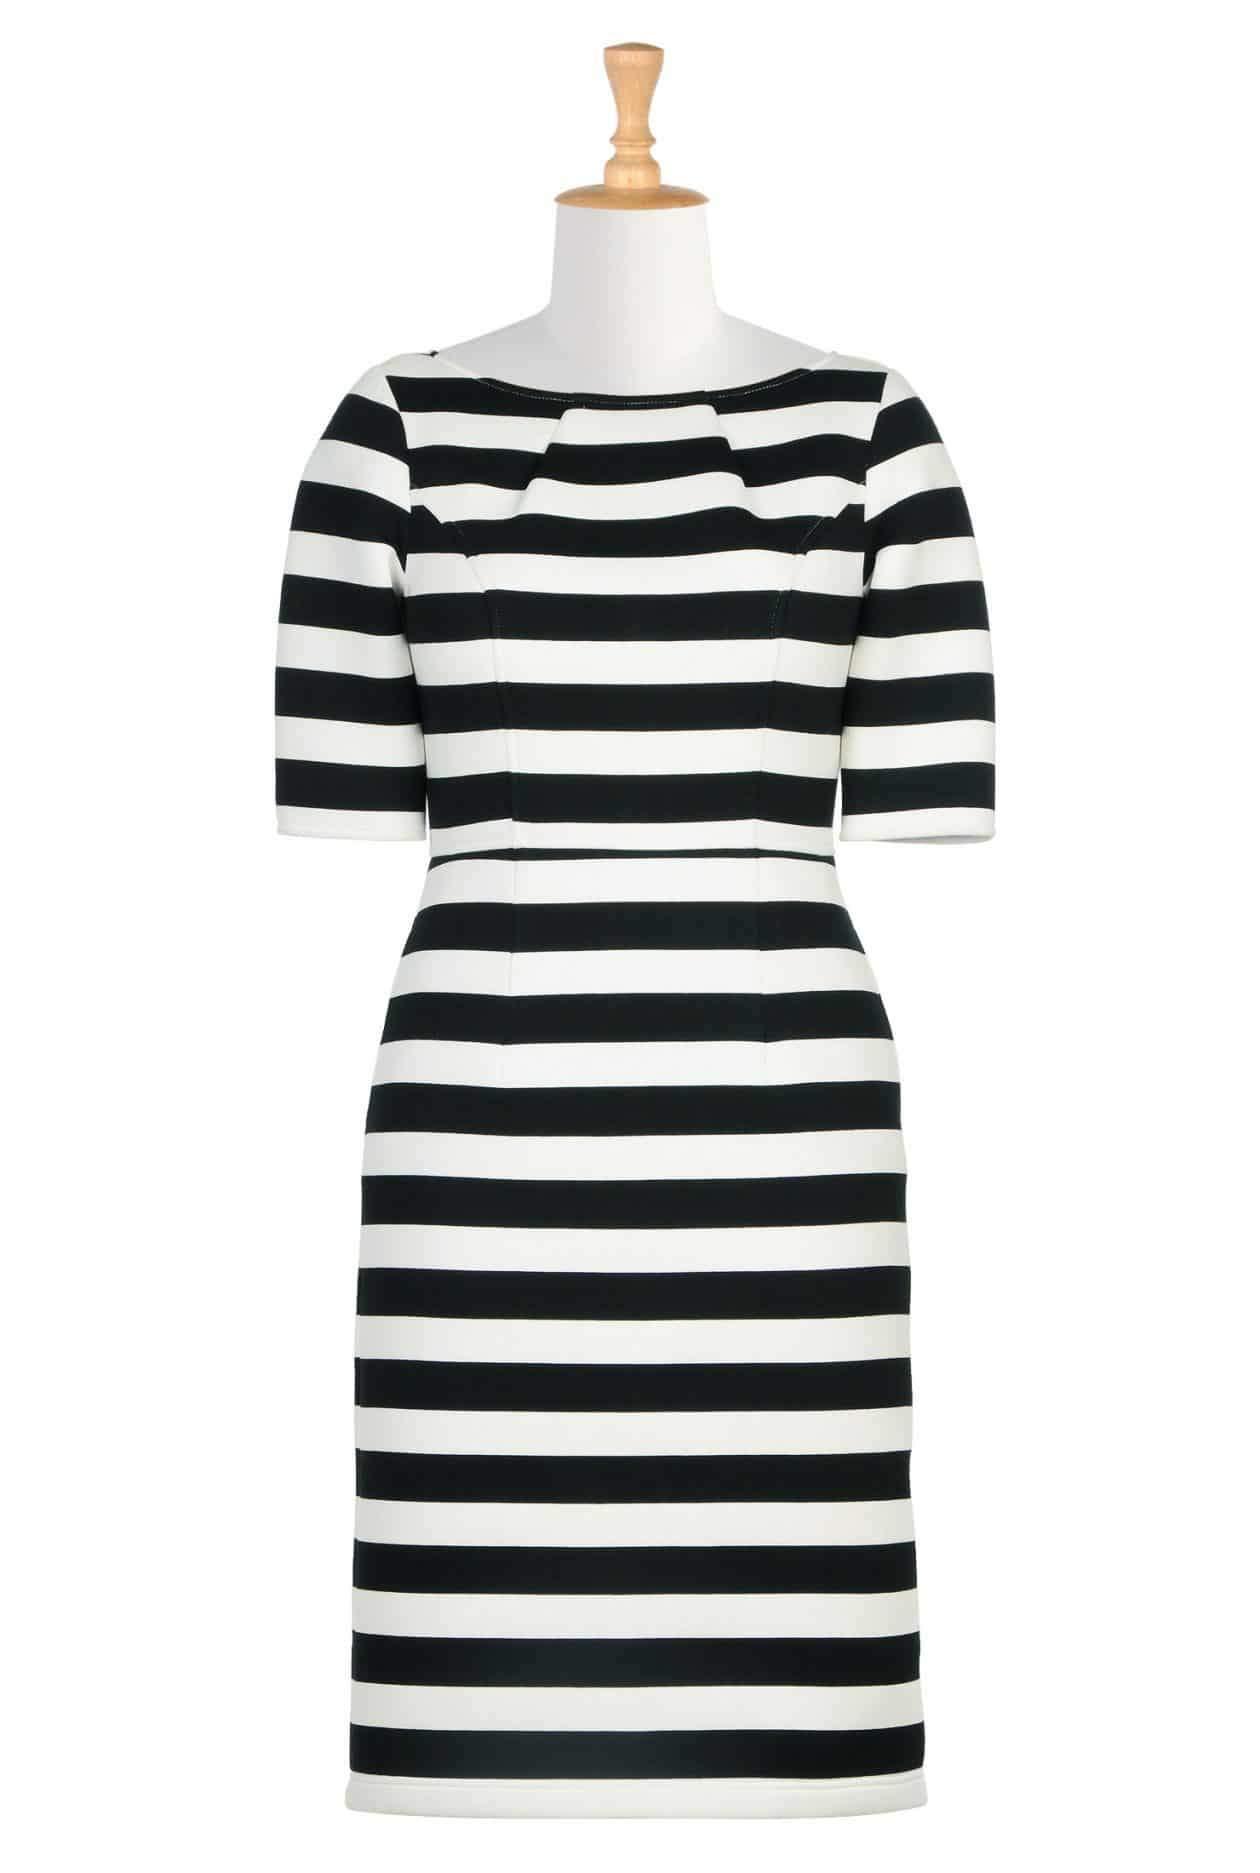 Bold stripe bonded knit dress via TheCurvyFashionista.com